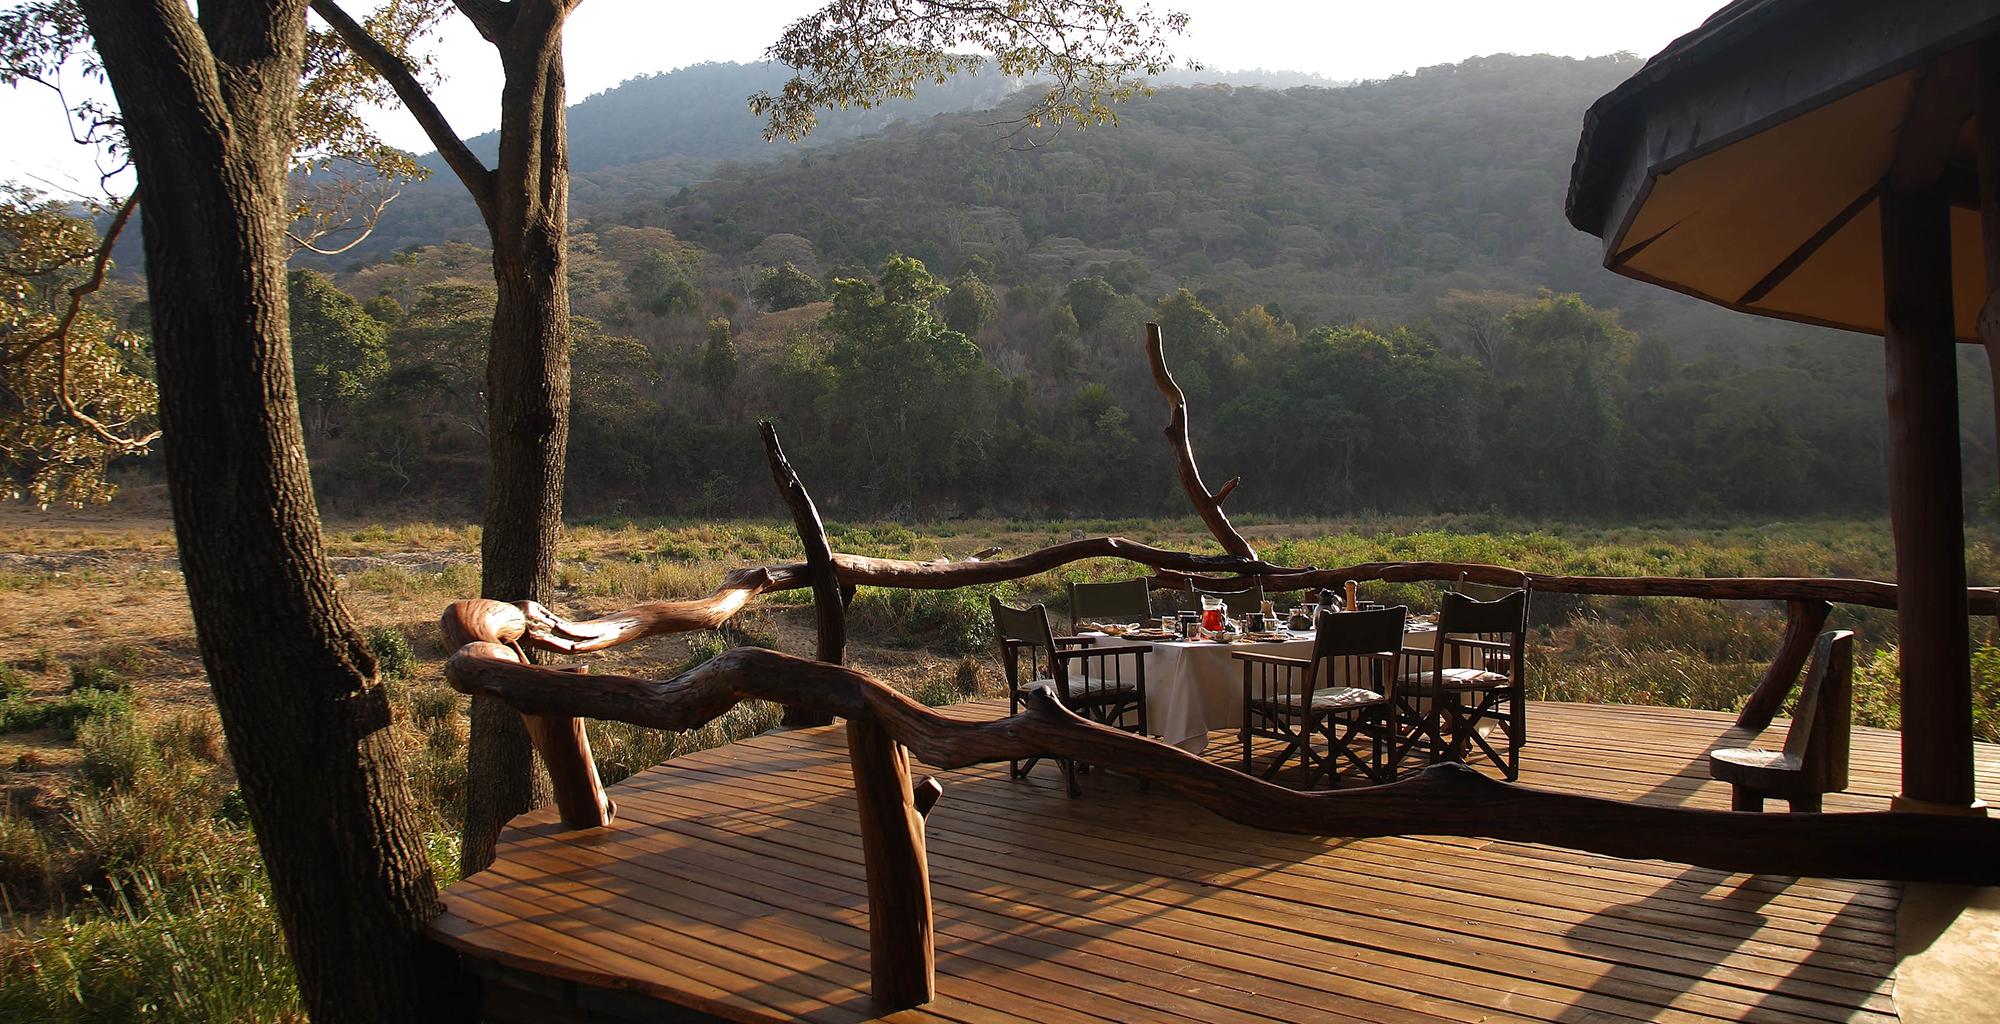 Kenya-Kitich-Camp-Deck-Dining